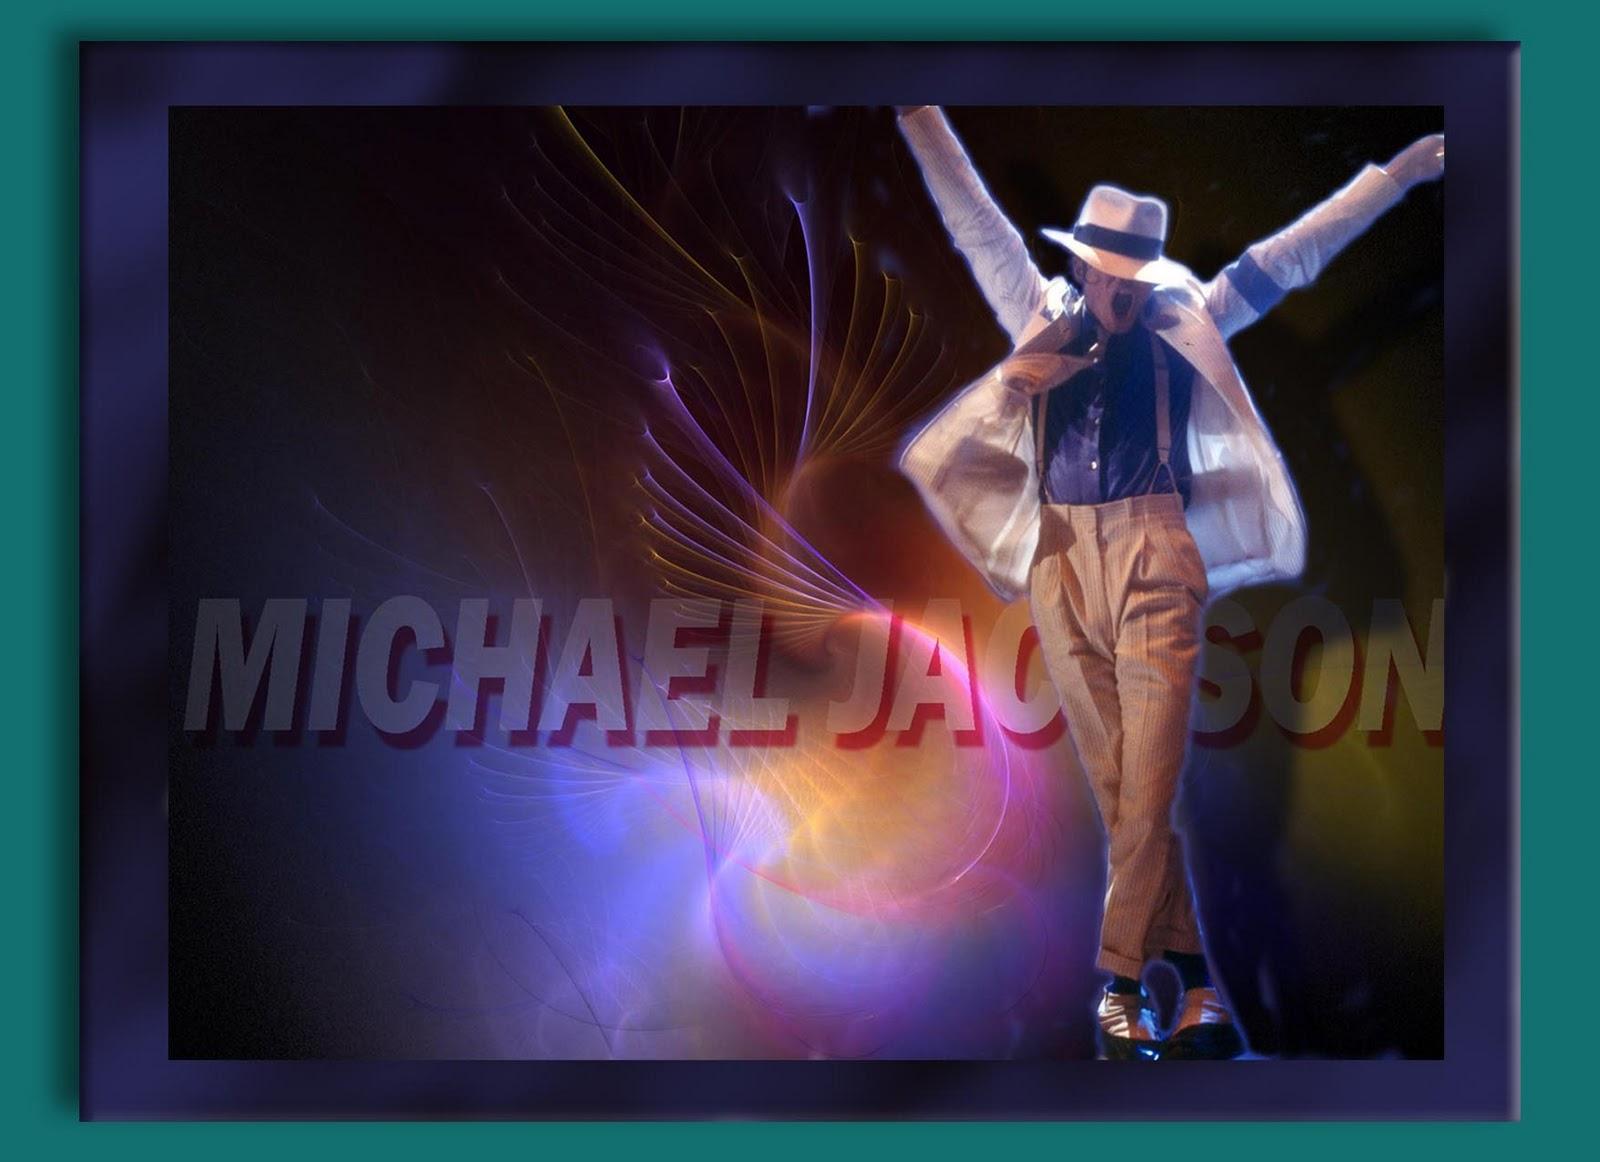 http://2.bp.blogspot.com/_vDWXjxRH6qA/TU_5Vpez0fI/AAAAAAAAA2g/OrJK8FEYDac/s1600/michael_jackson_3.jpg